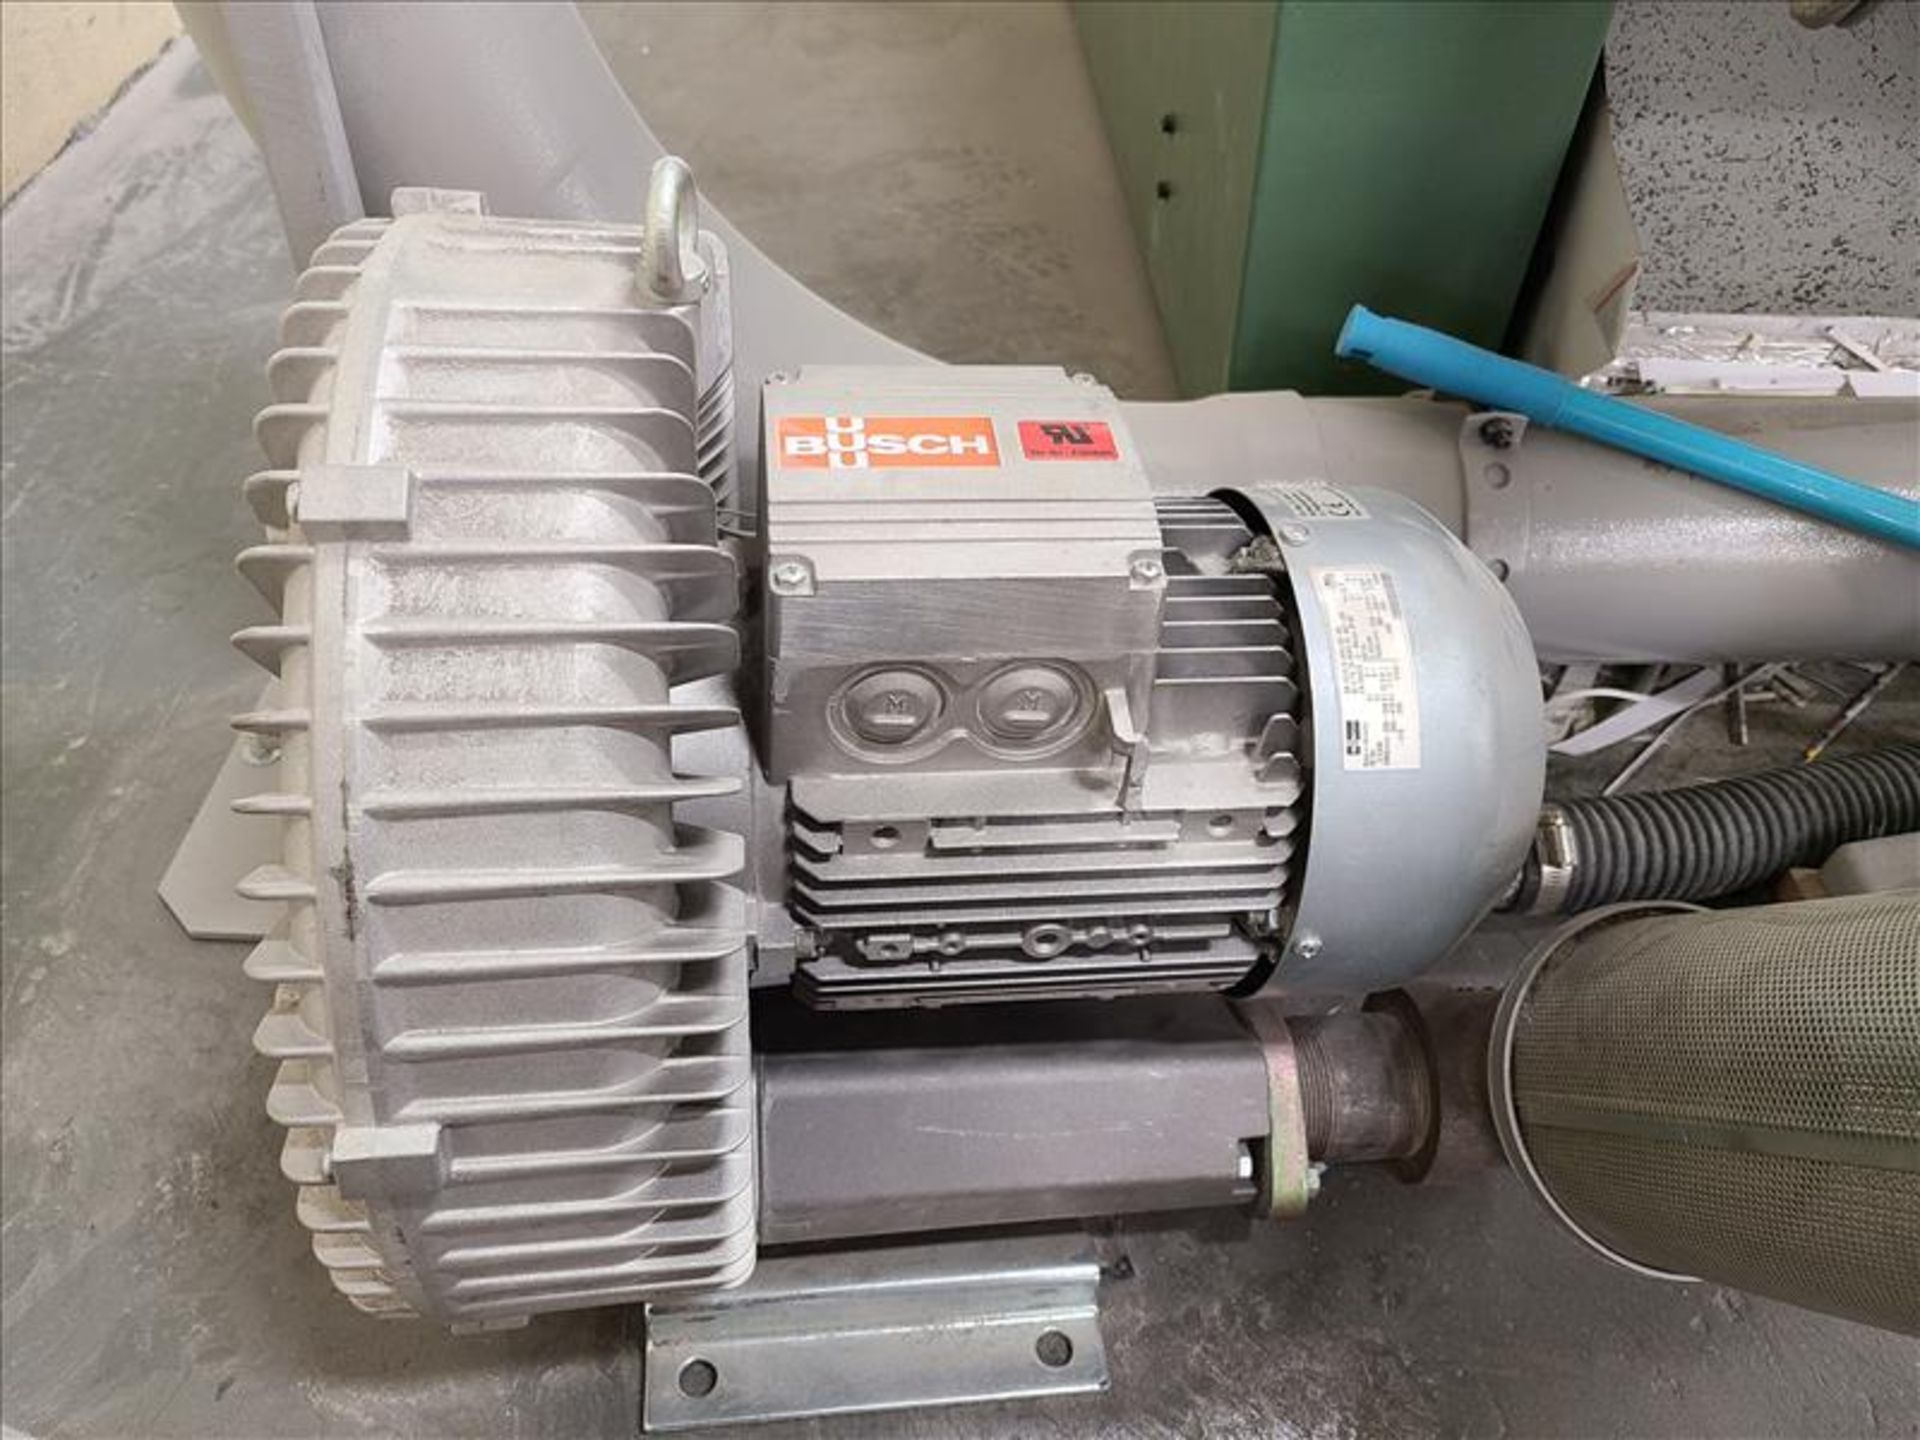 Muller Martini,Valore, 8 Station Saddle Stitcher, model 1558.0404, S/N.NN25808, 230V, 3 Phase, - Image 12 of 13